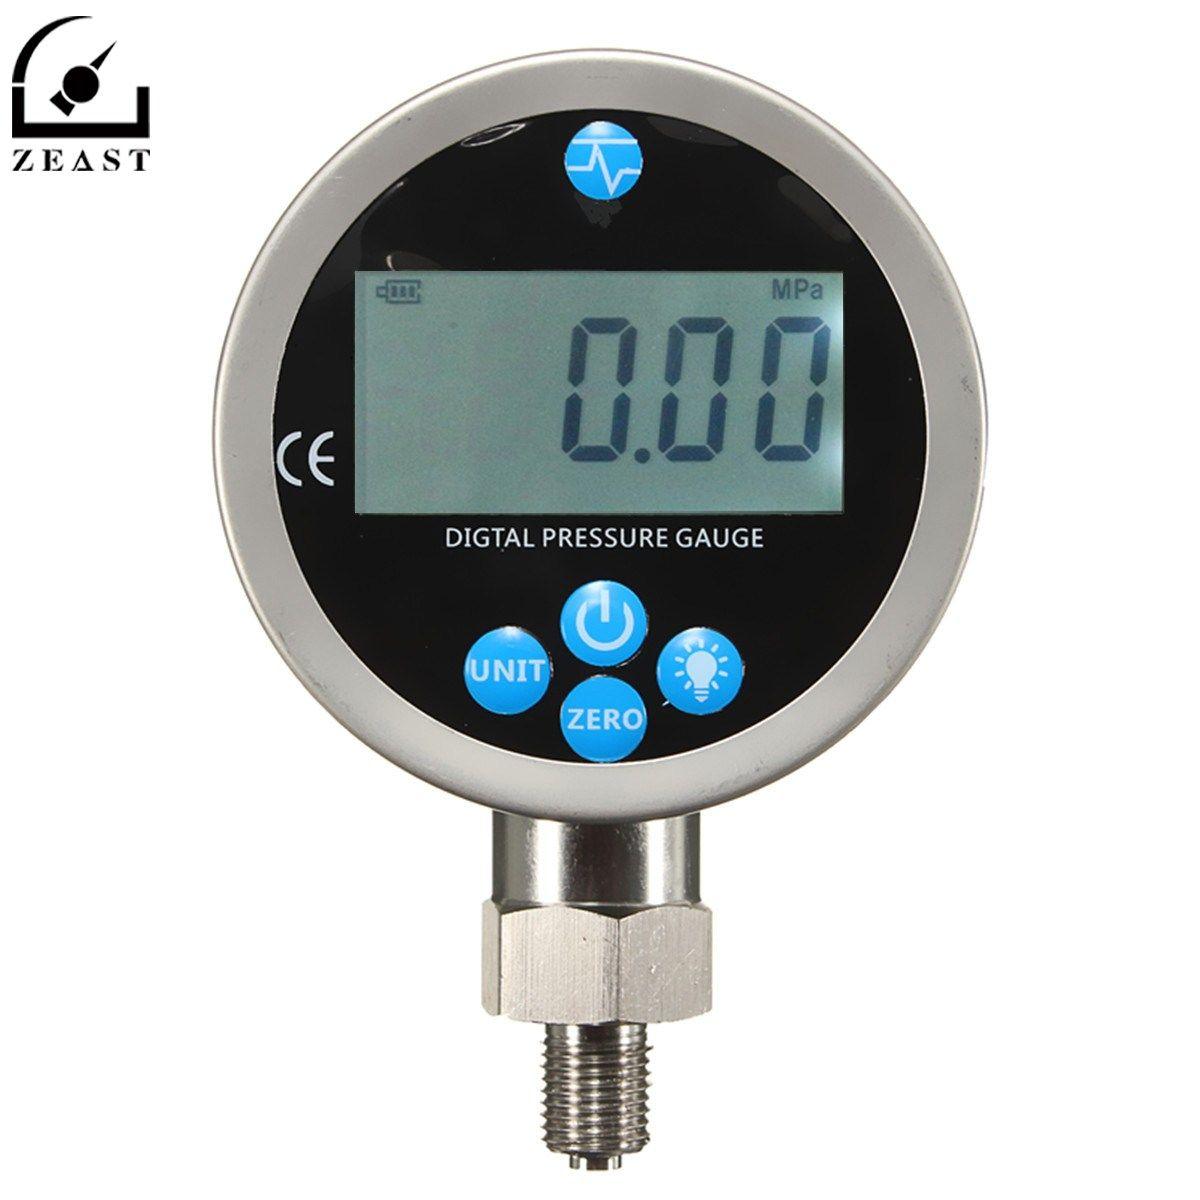 Digital Hydraulic Pressure Gauge 400BAR/40Mpa/10000PSI with BSP1/4 Connector Backlight Pressure Tester Meter